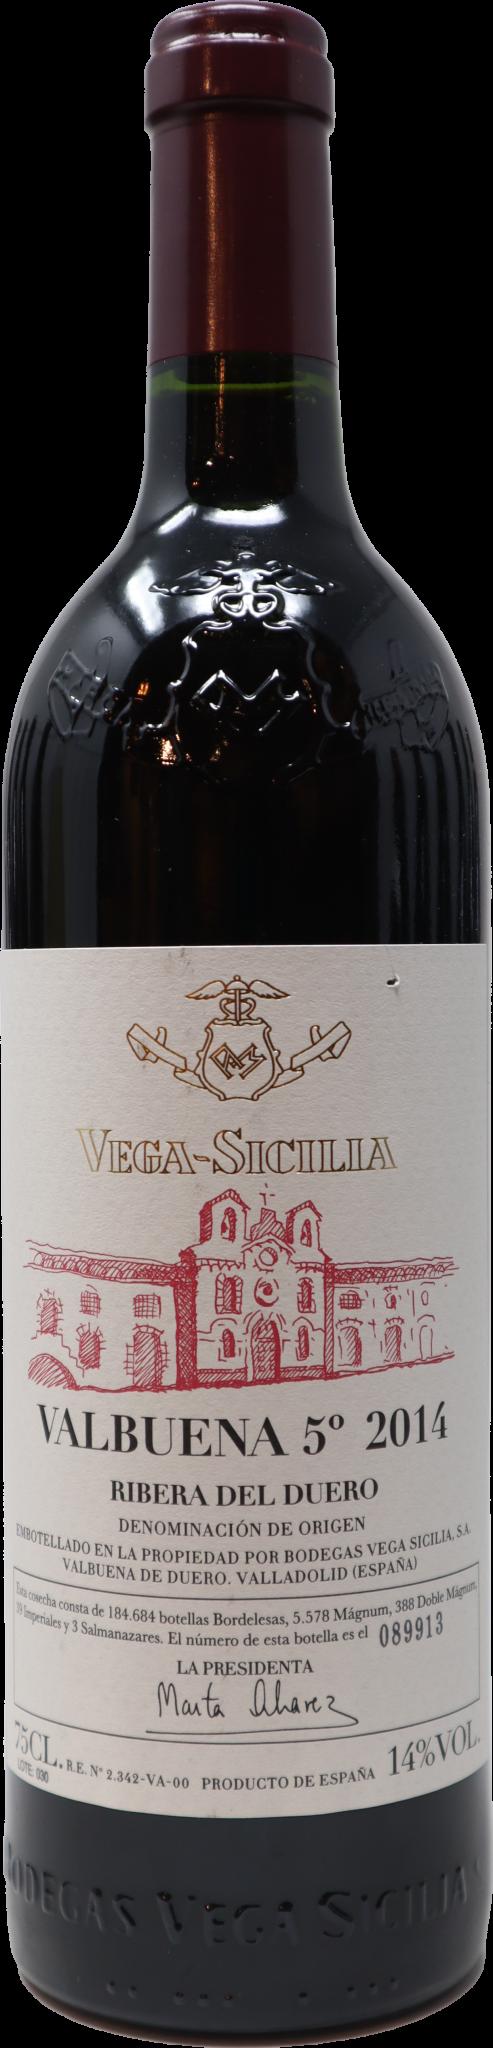 2014 Vega Sicilia Valbuena 5 Ribera Del Duero Perrine S Wine Shop